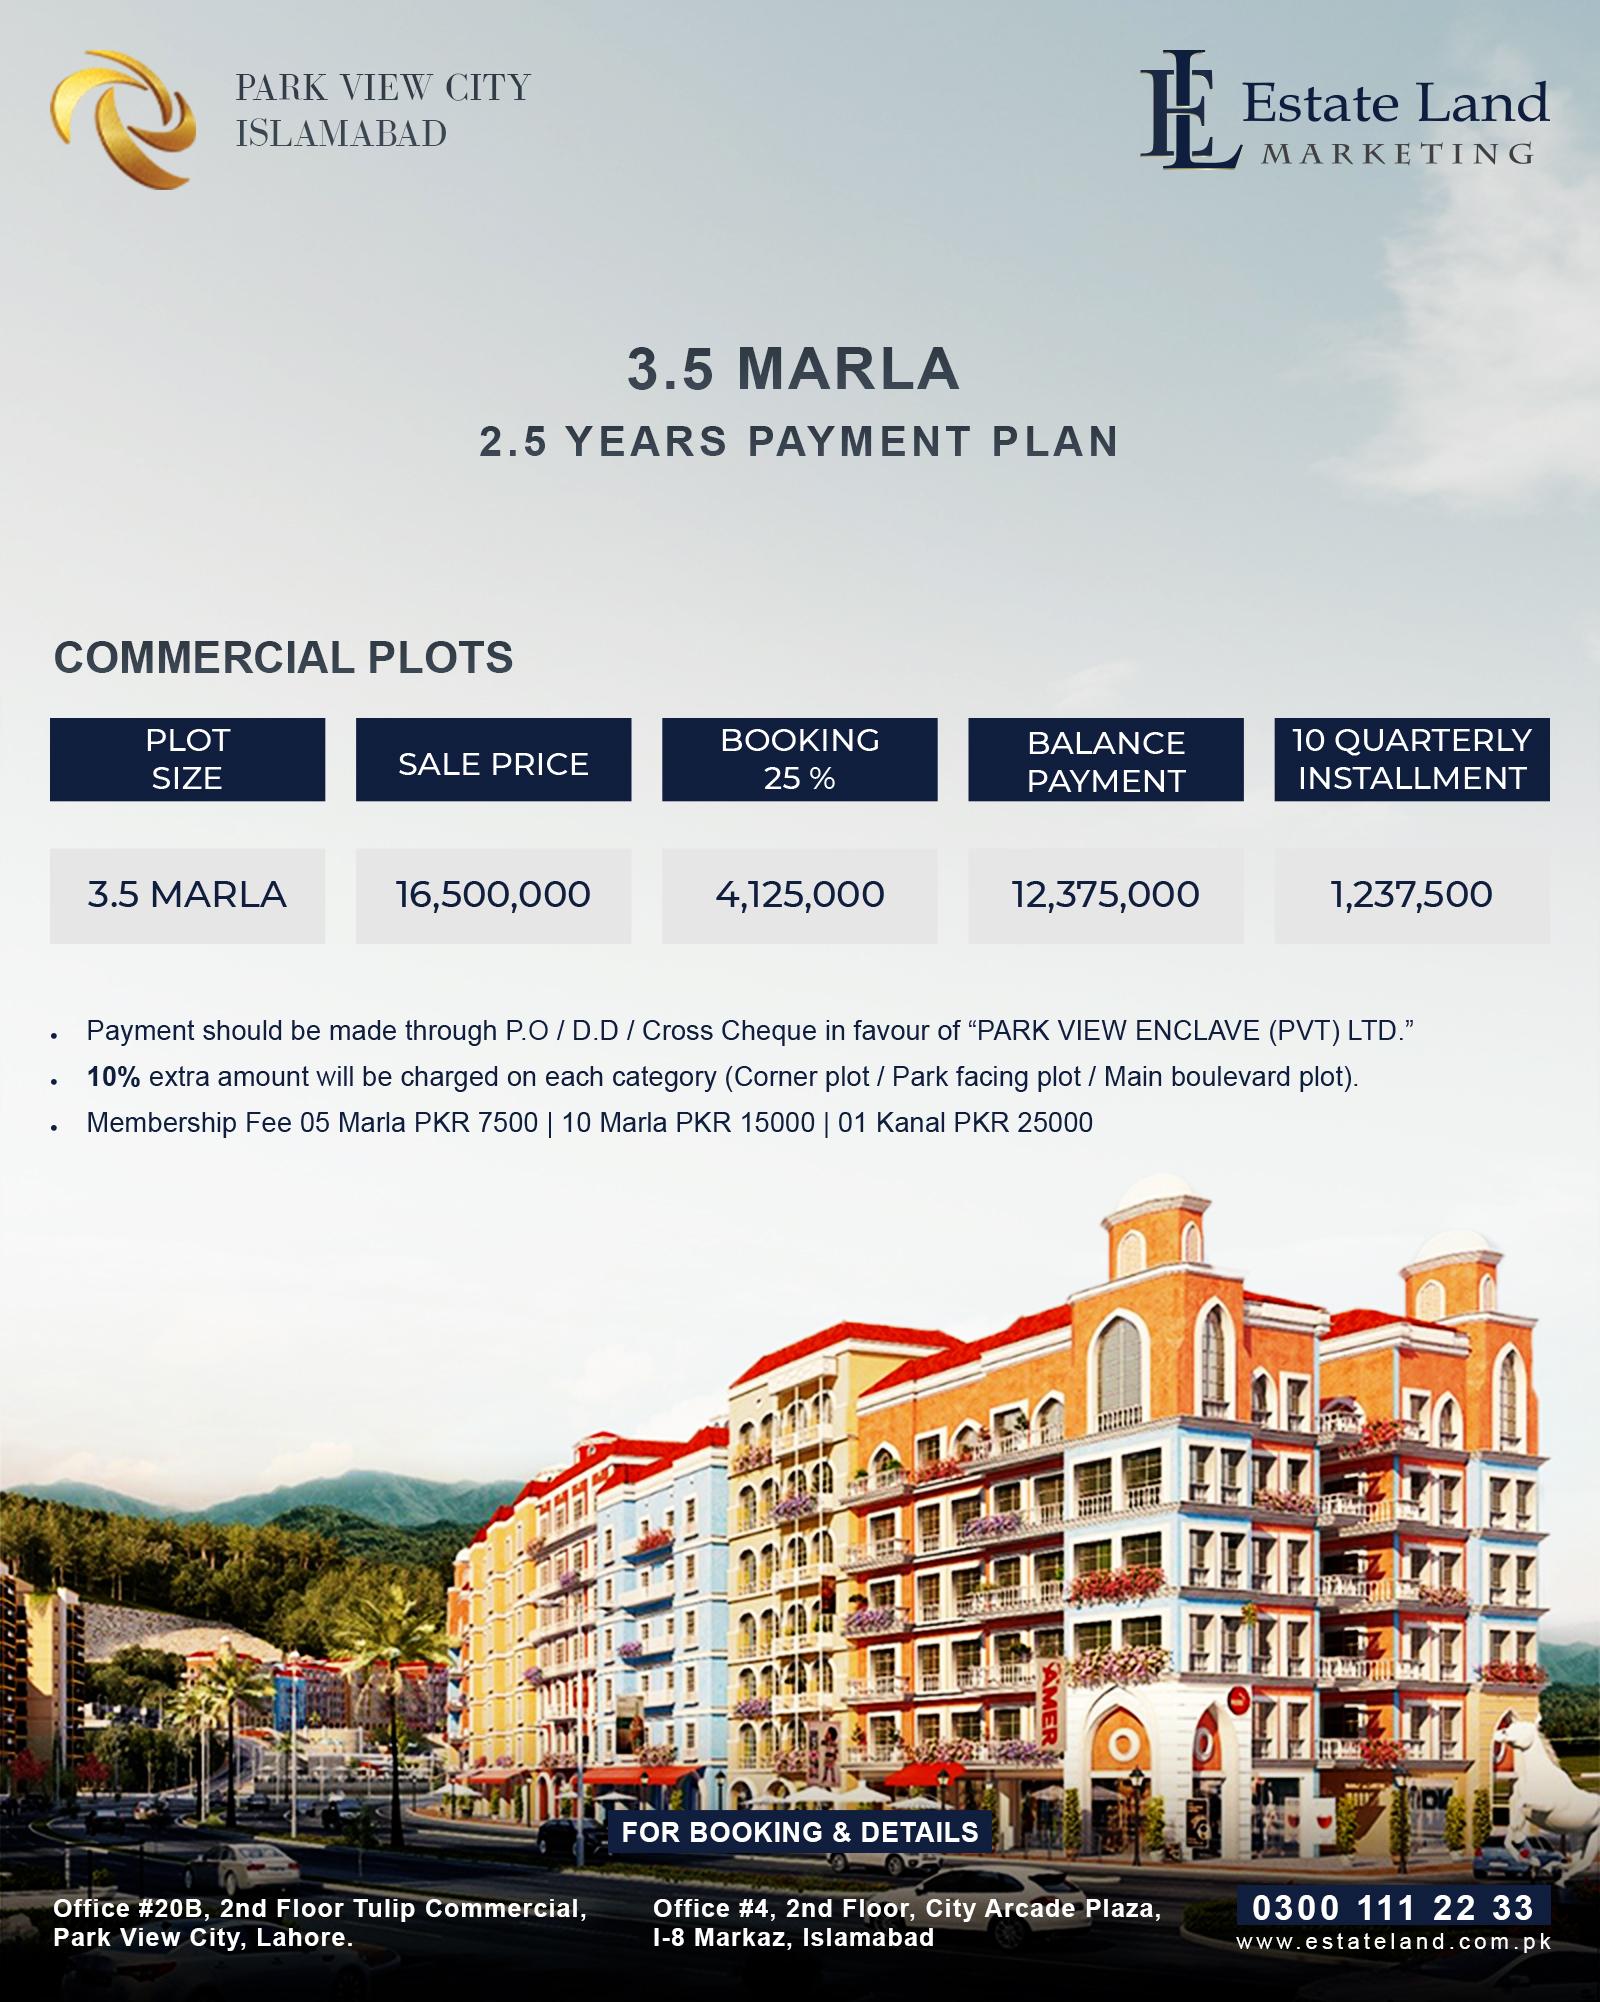 Park View City 3.5 marla commercial plot on installment